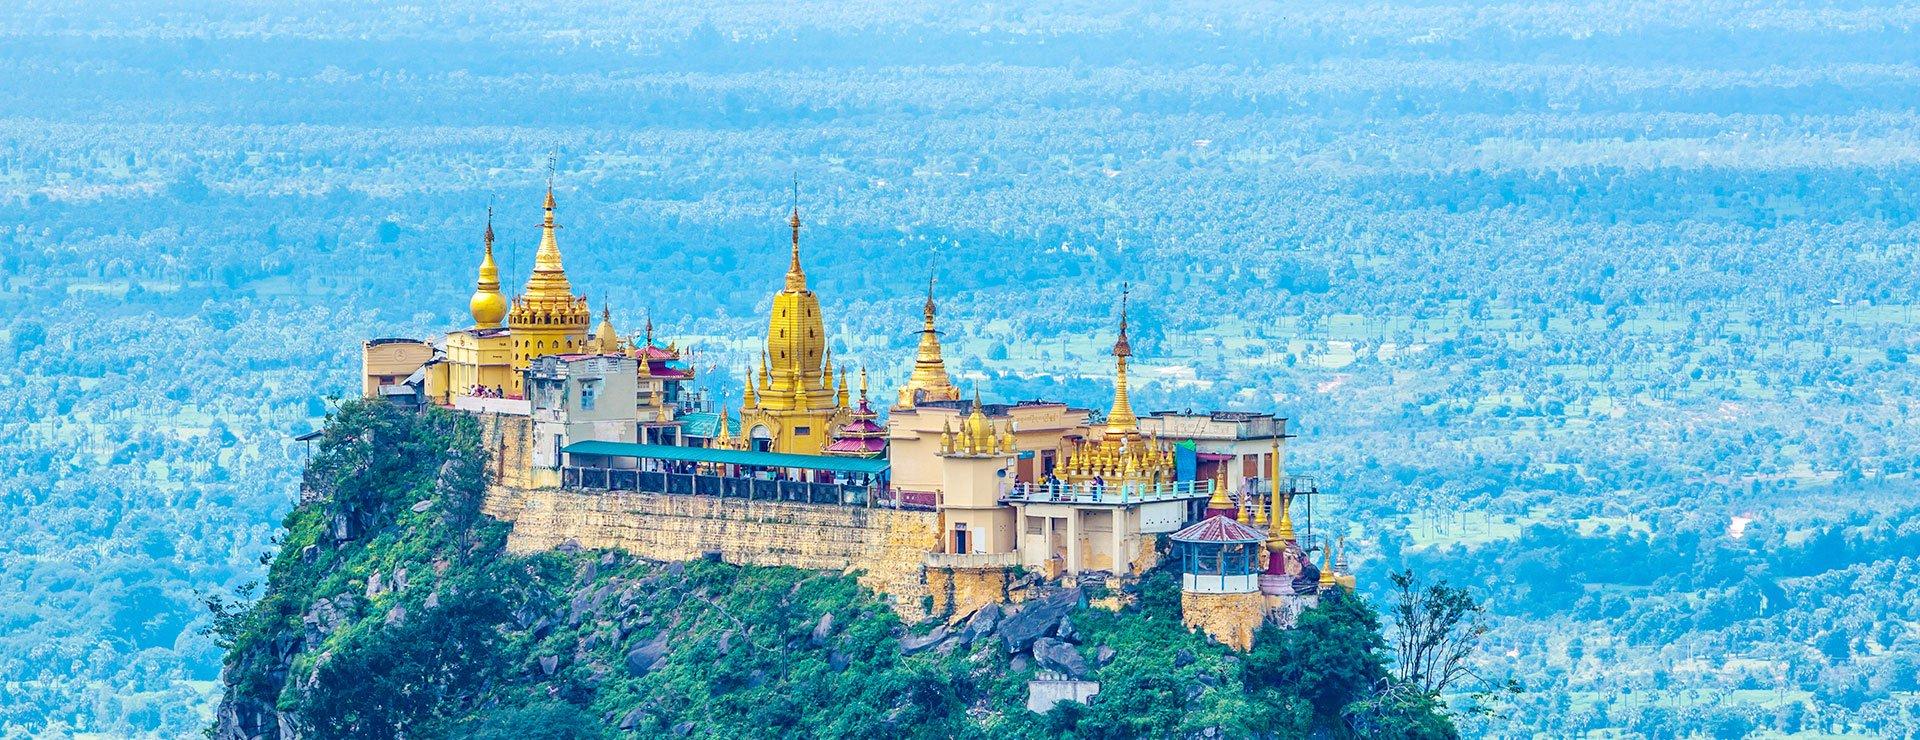 [Infographic] Top Street Foods to Try in Myanmar (Burma)